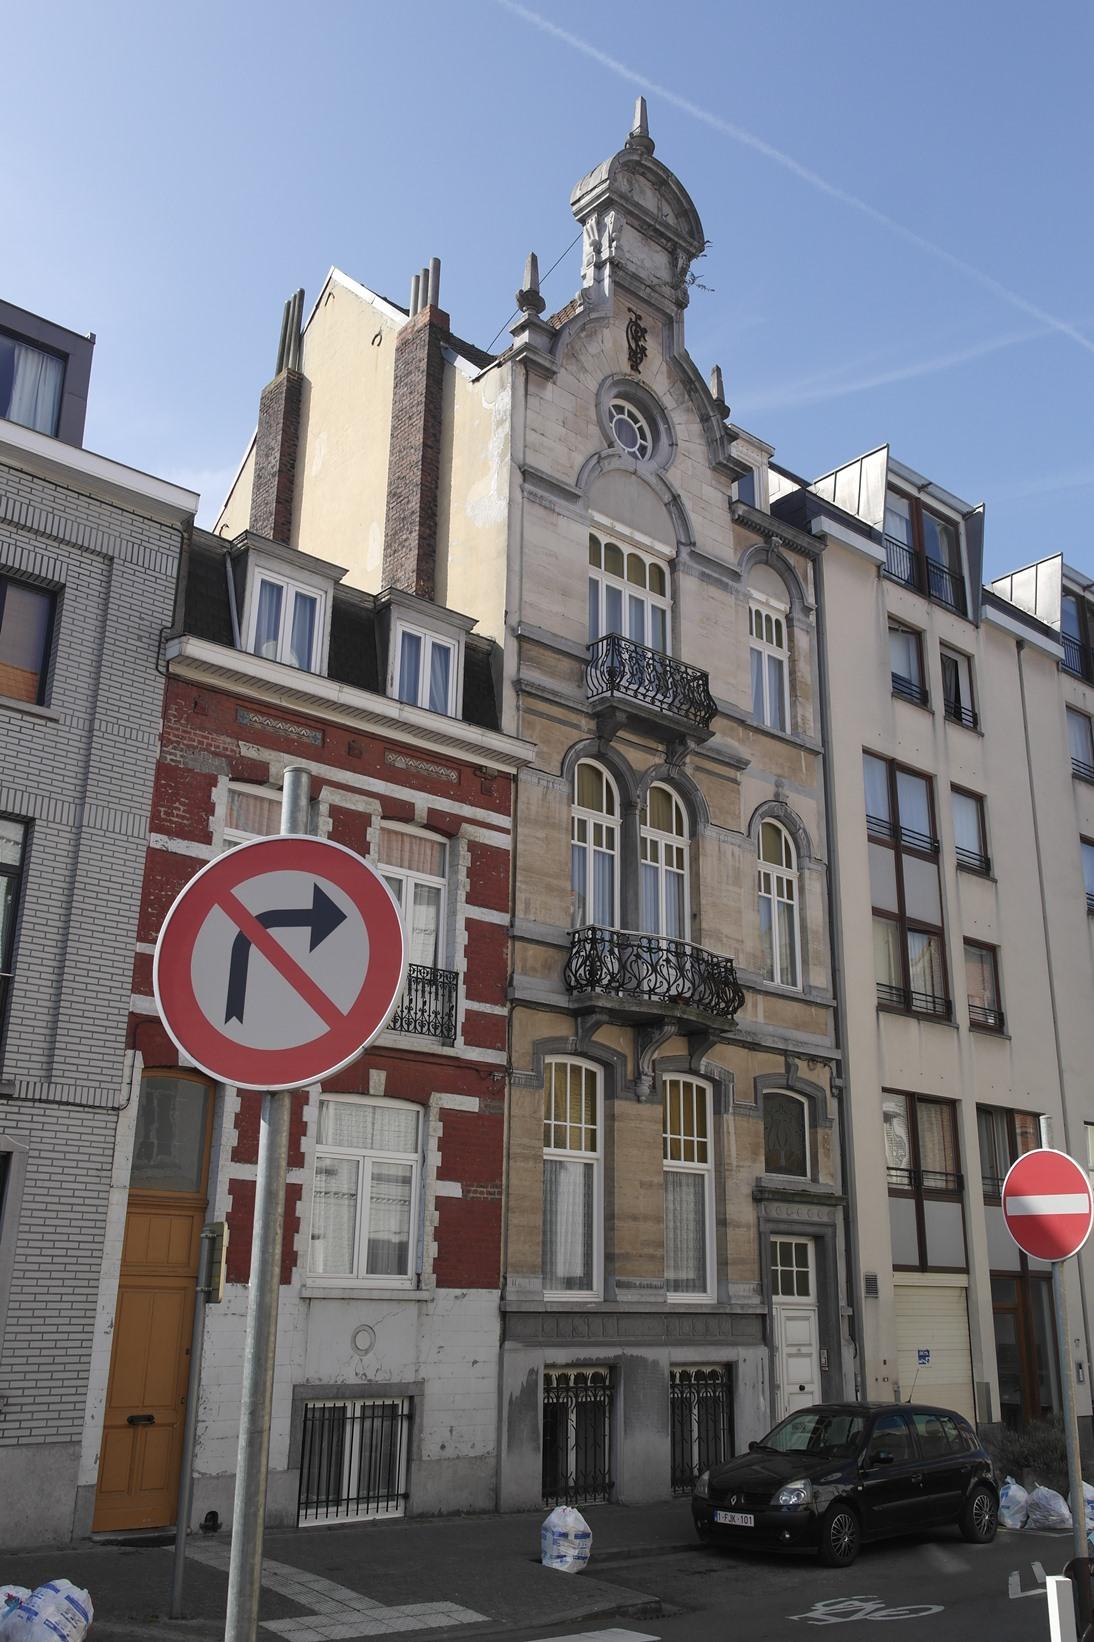 Rue de la Tannerie 15, 2014